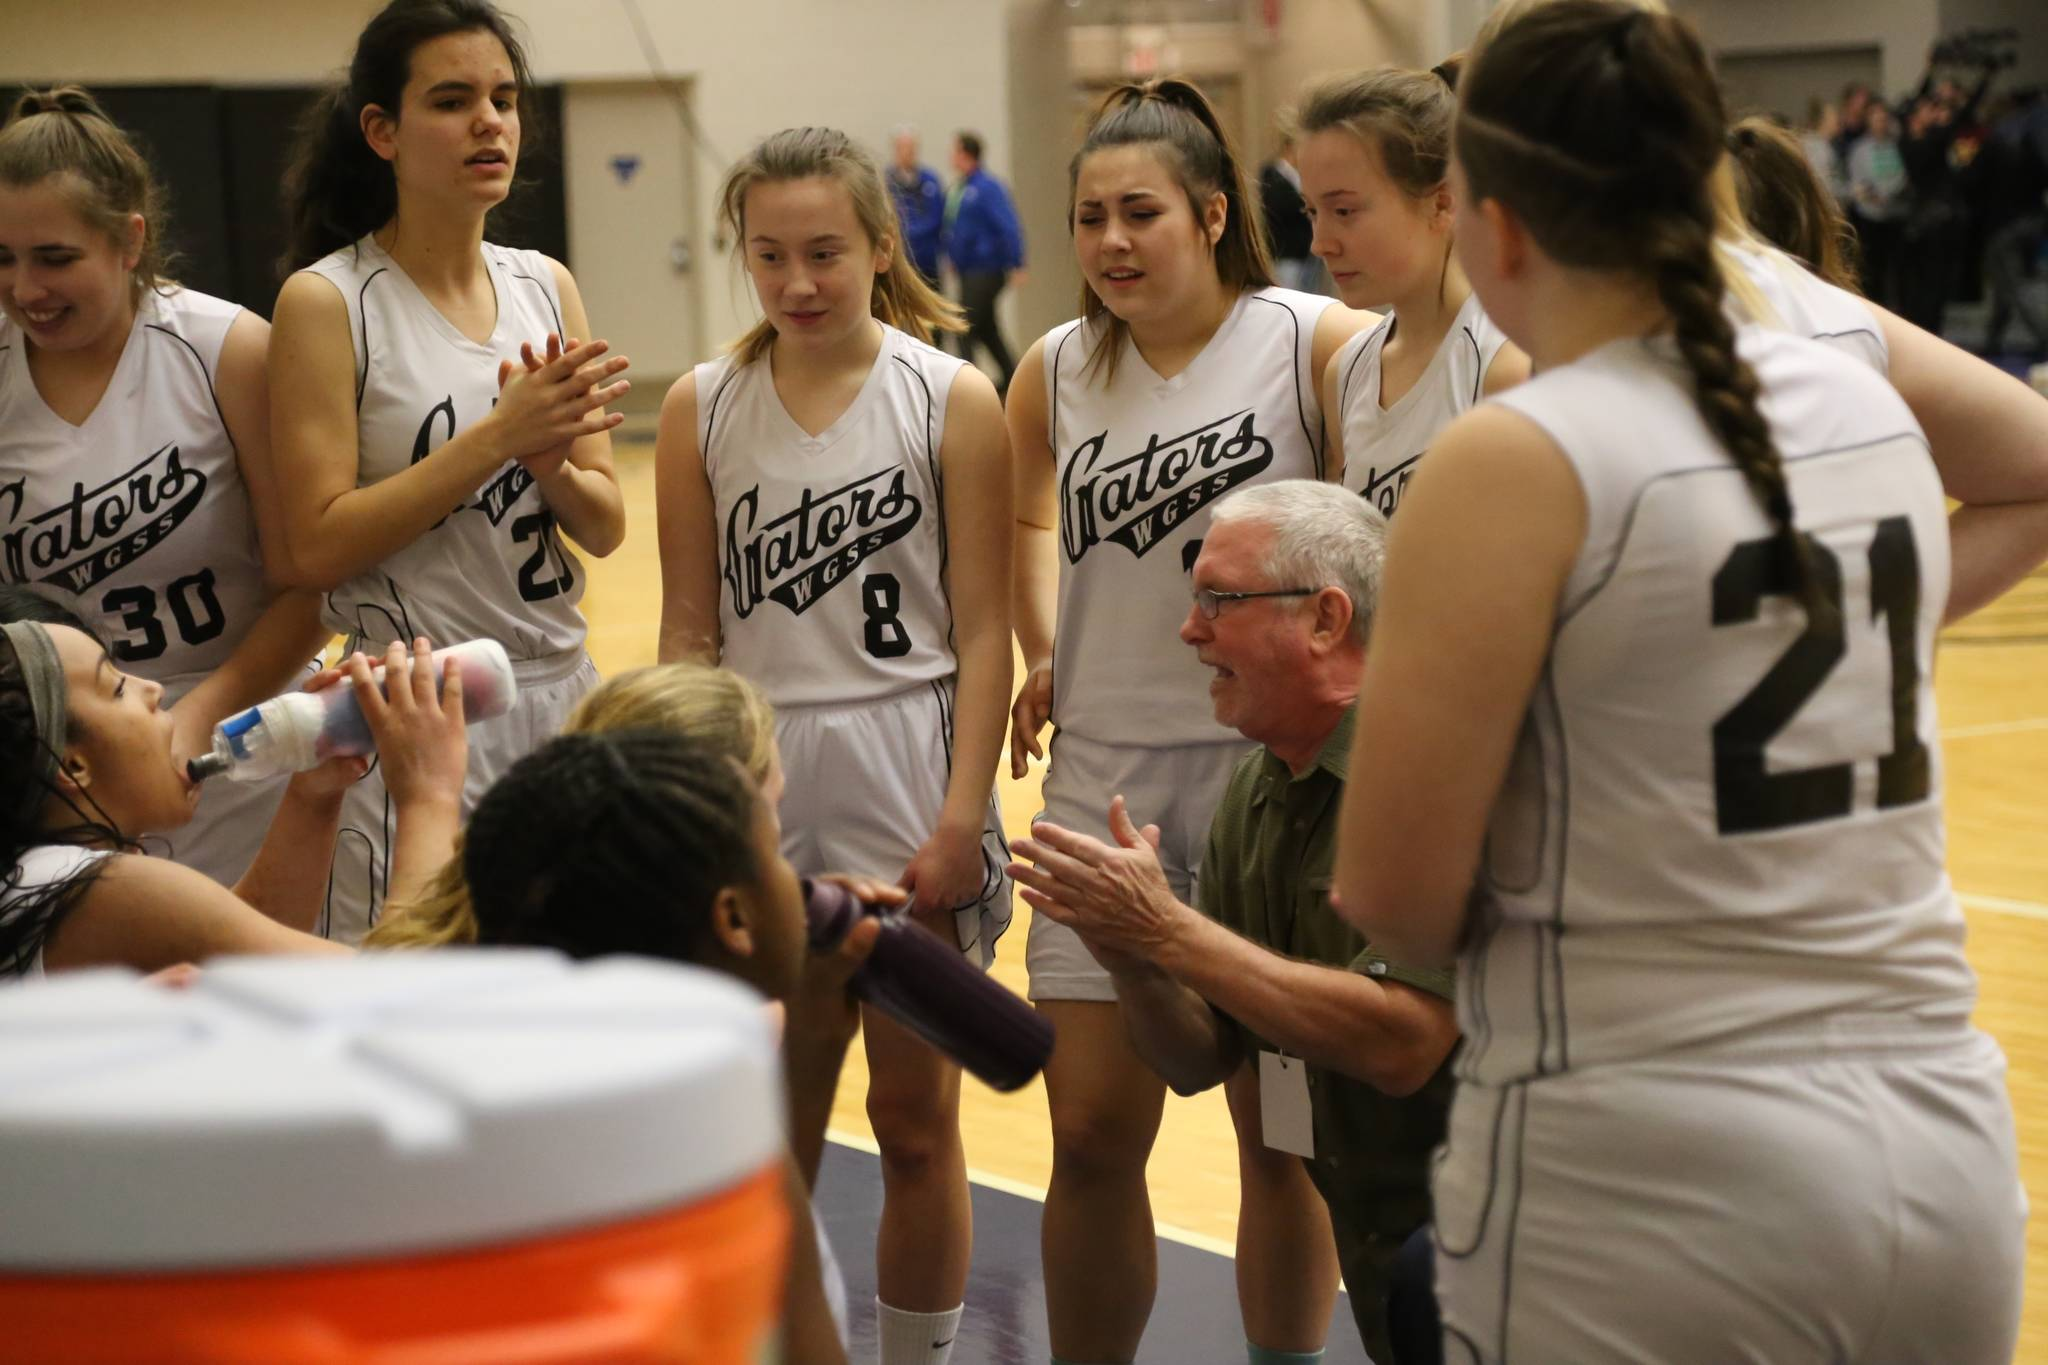 Coach Grant Inkster gives instruction. Greg Laychak Black Press